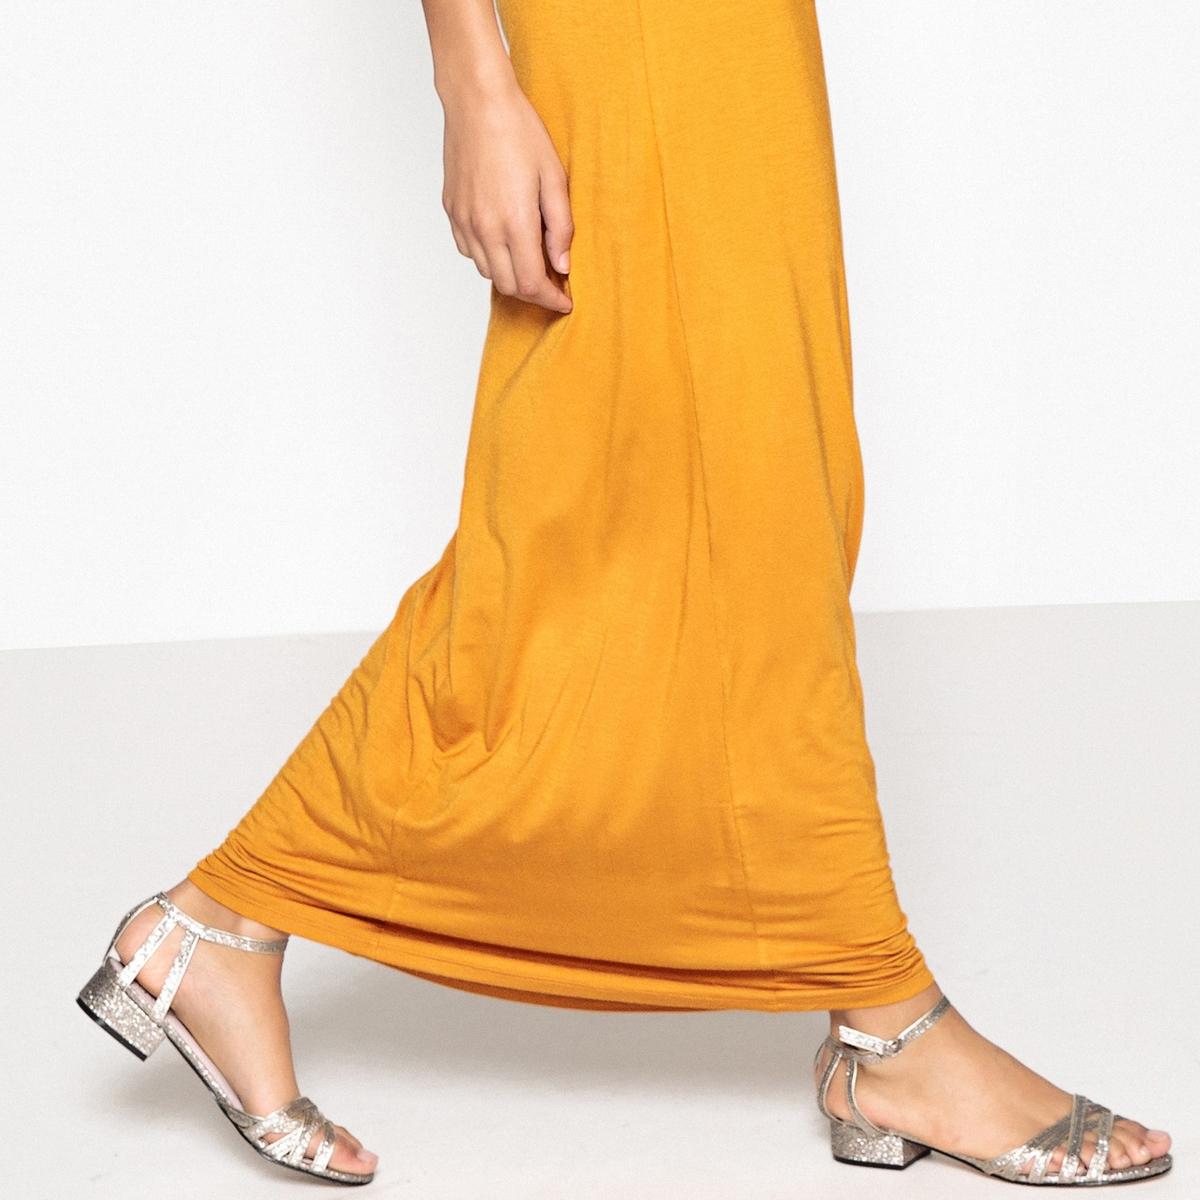 Sandalias brillantes con correas múltiples